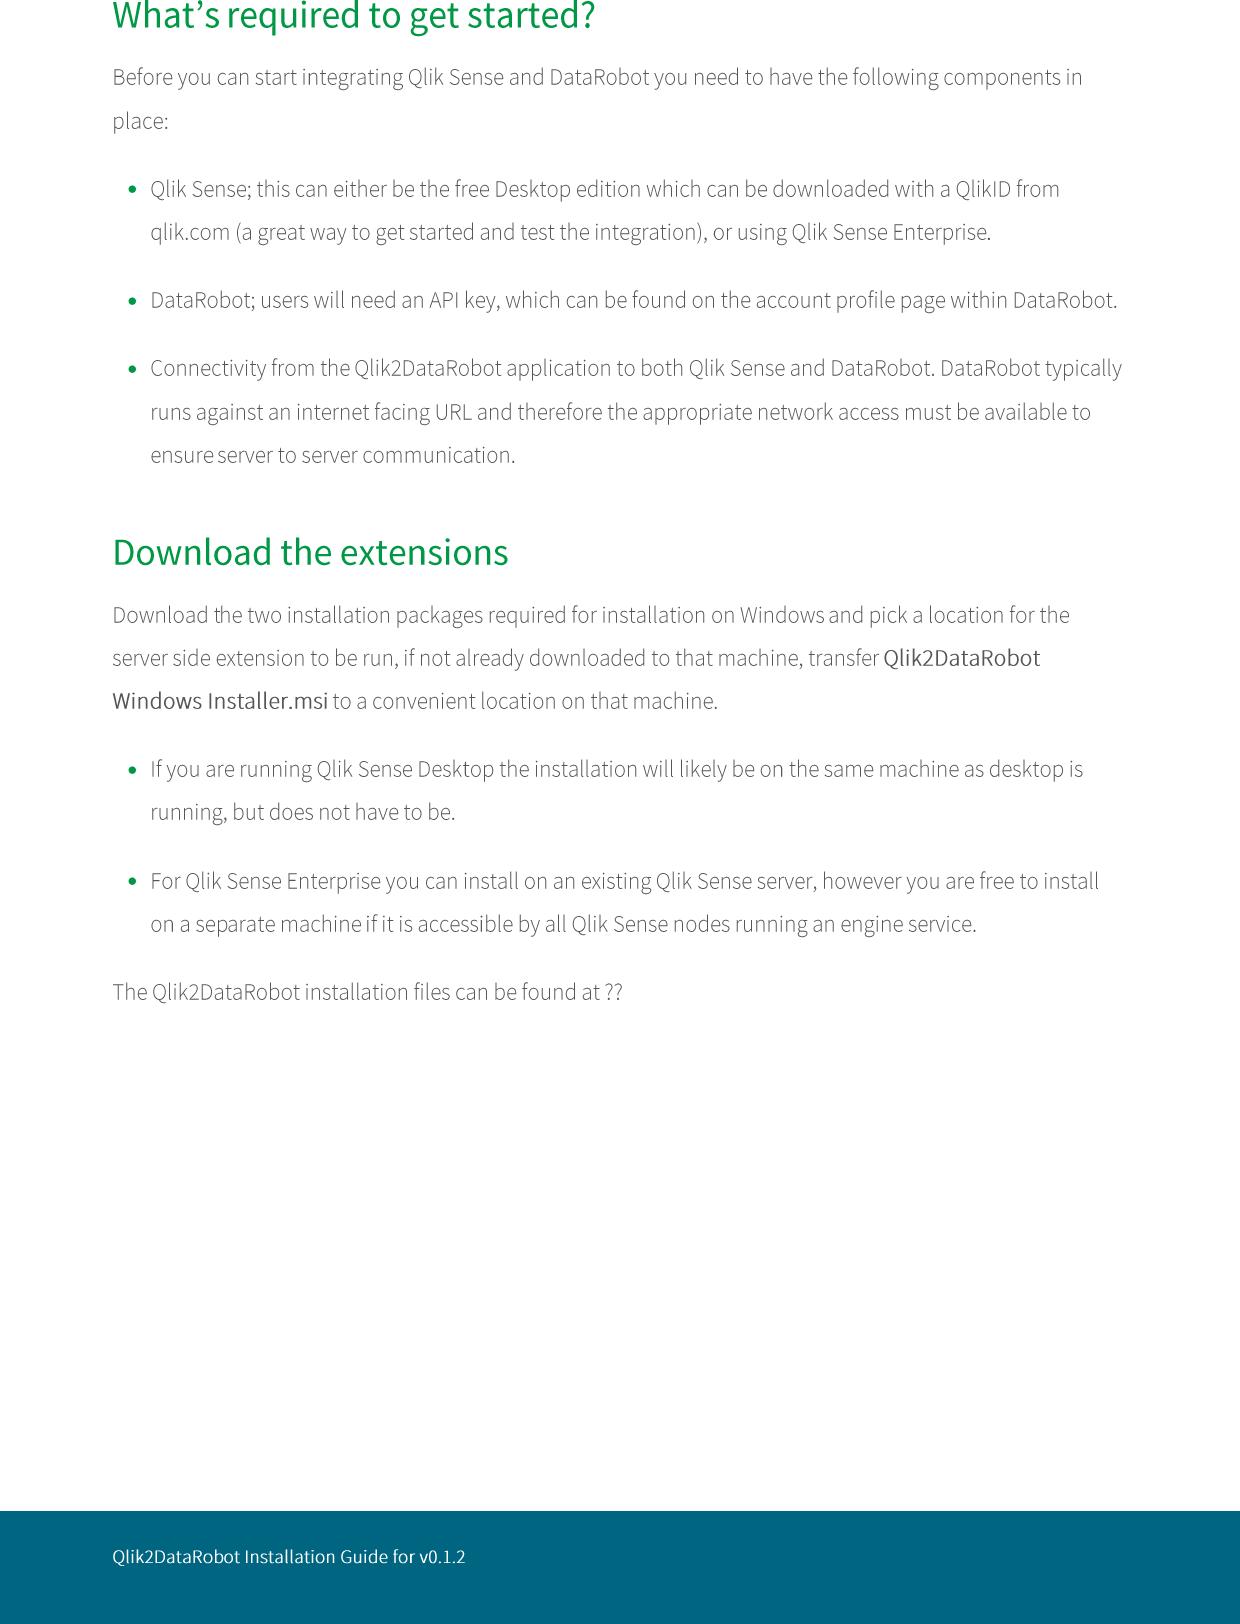 Qlik's Approach To Big Data Qlik2Data Robot Installation Guide For